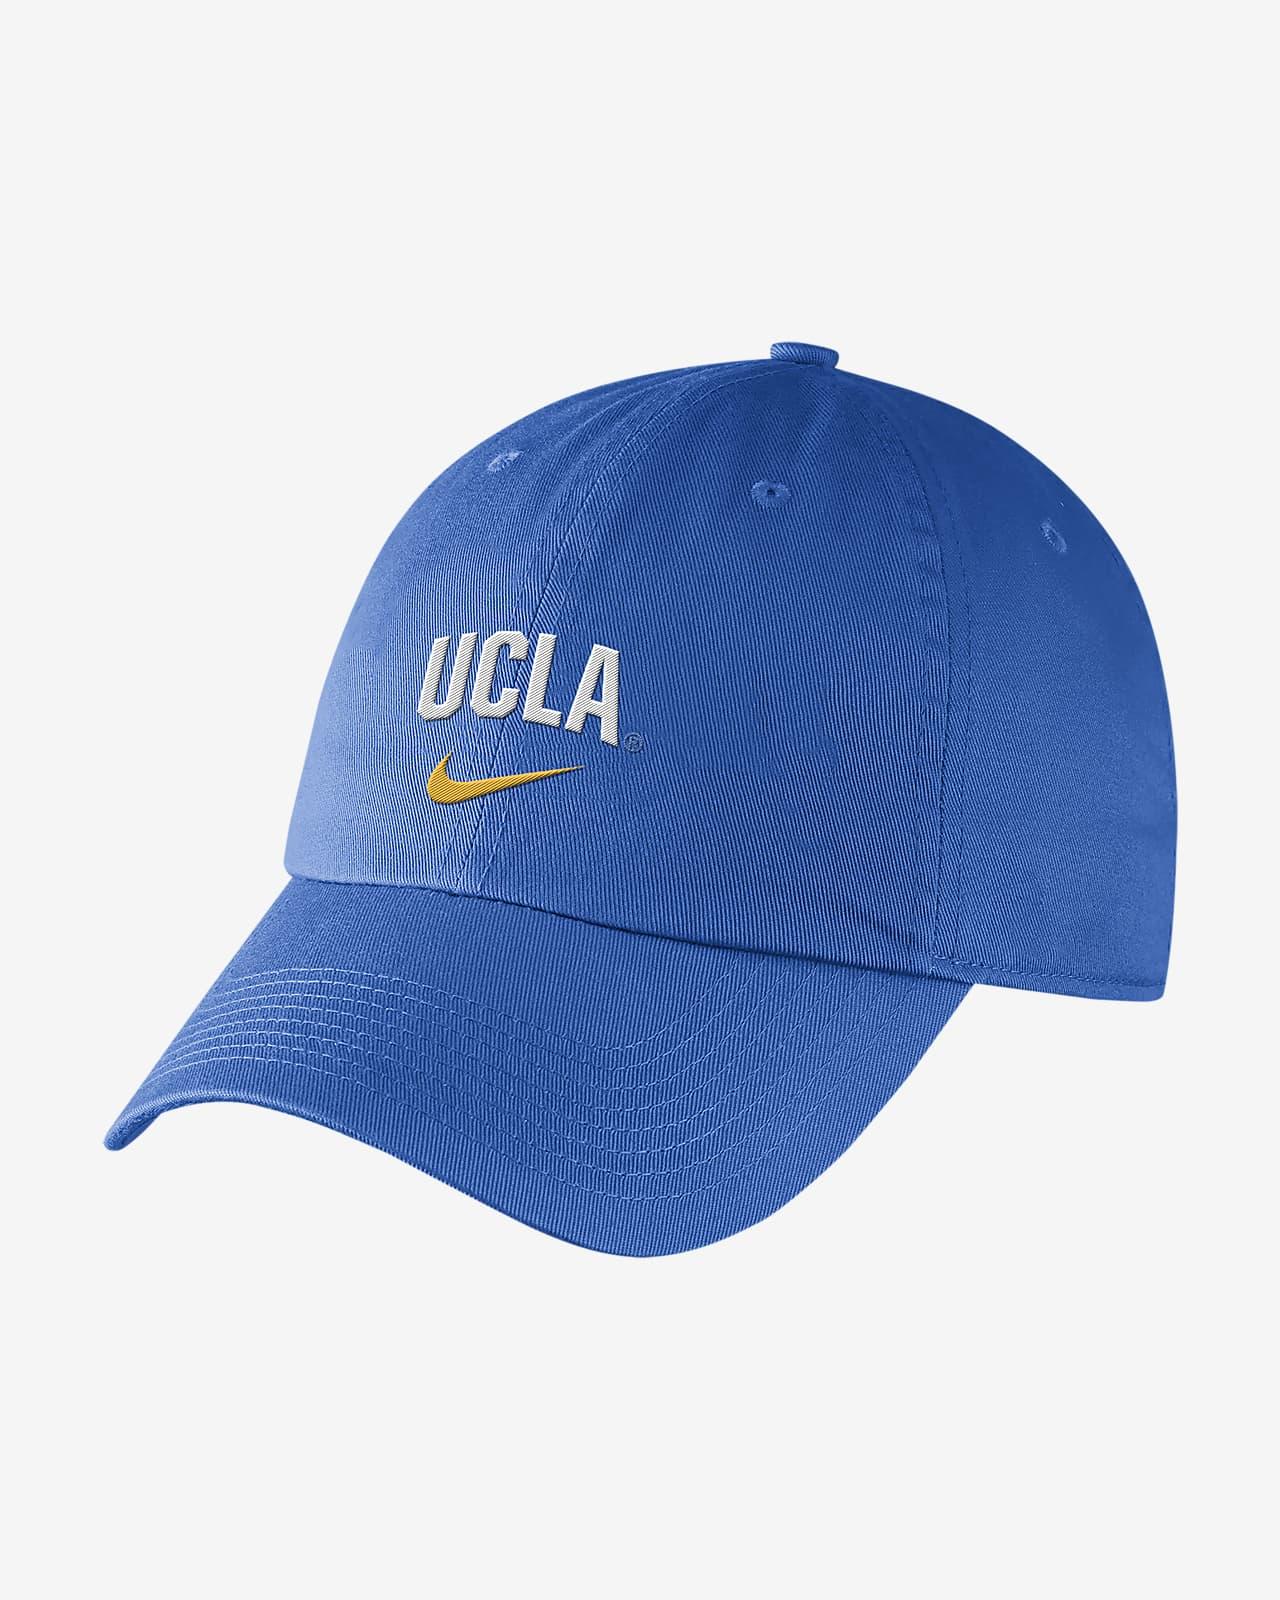 Nike College (UCLA) Hat